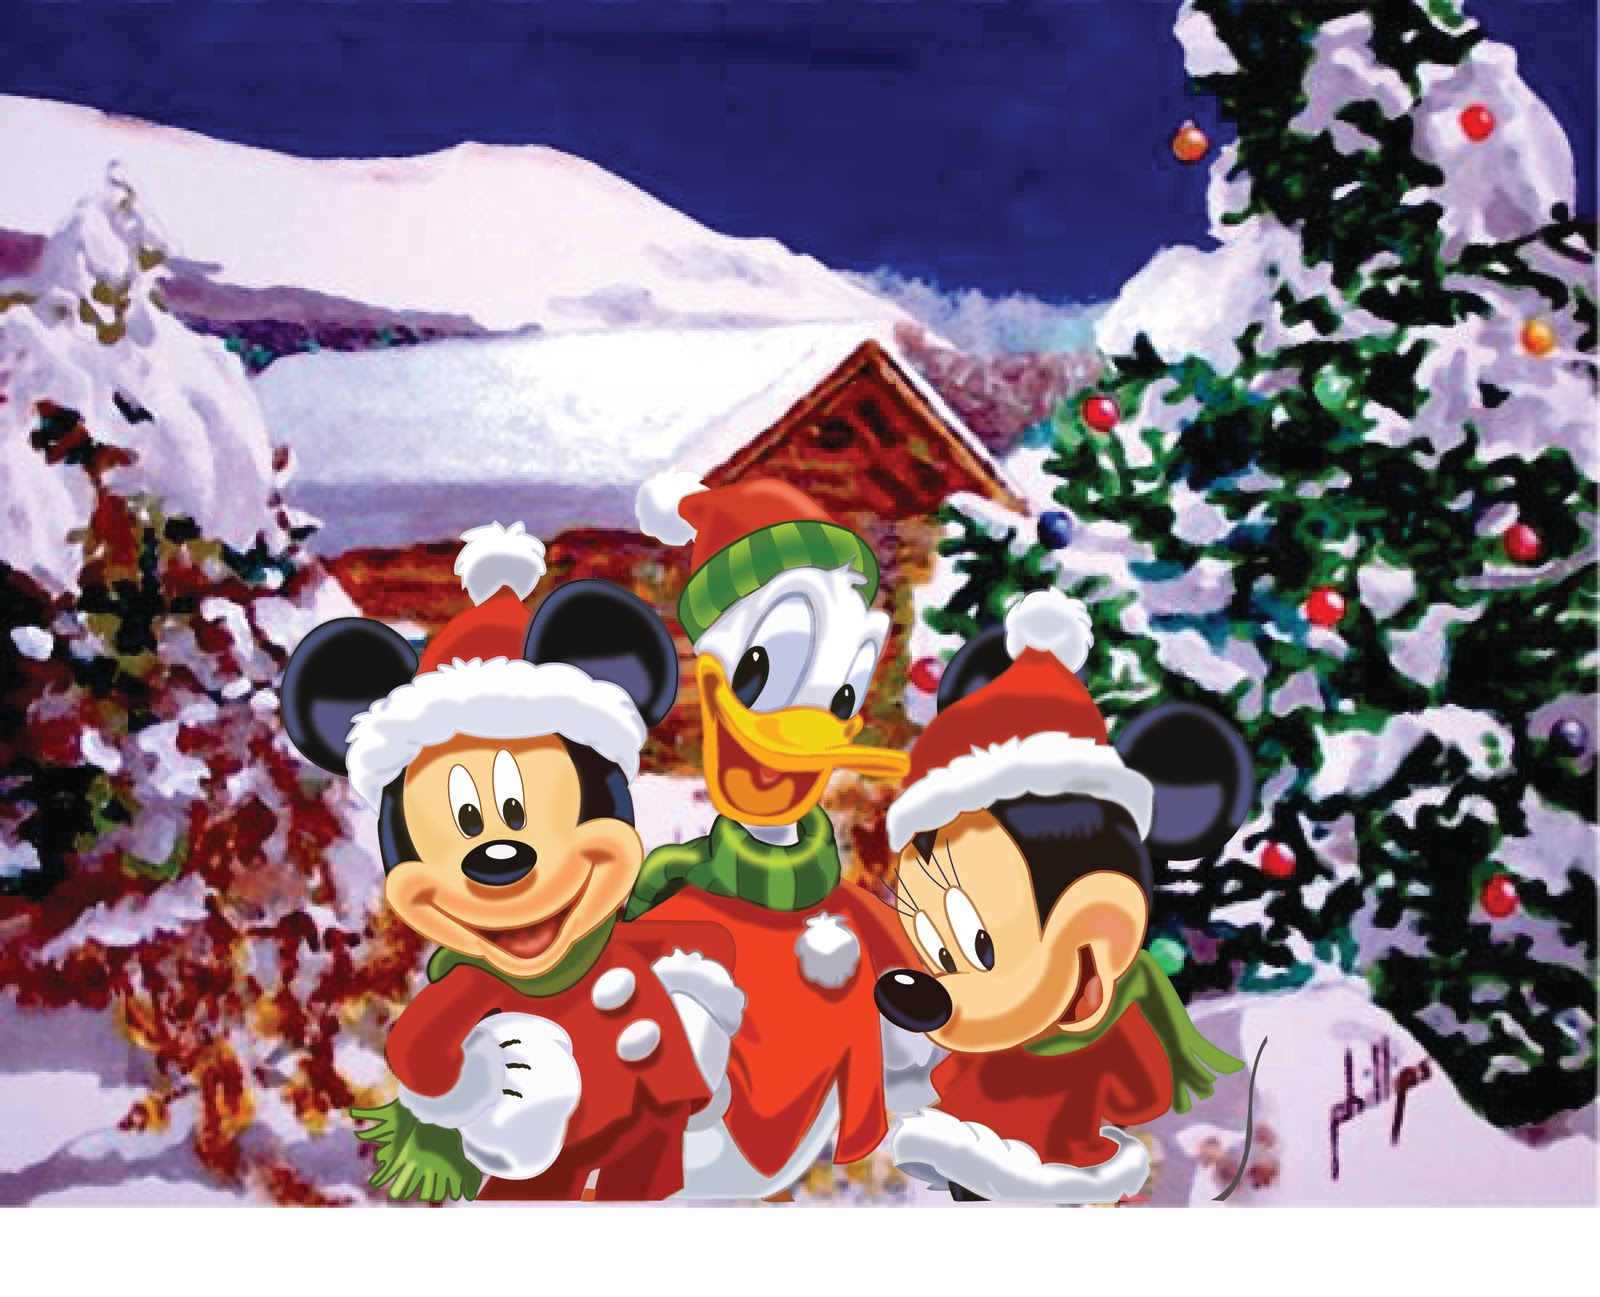 http://3.bp.blogspot.com/-OCmG14VW93k/UN2L7pcykDI/AAAAAAAAAvk/AtGi6Xhy-3c/s1600/mickey+mouse+christmas.jpg